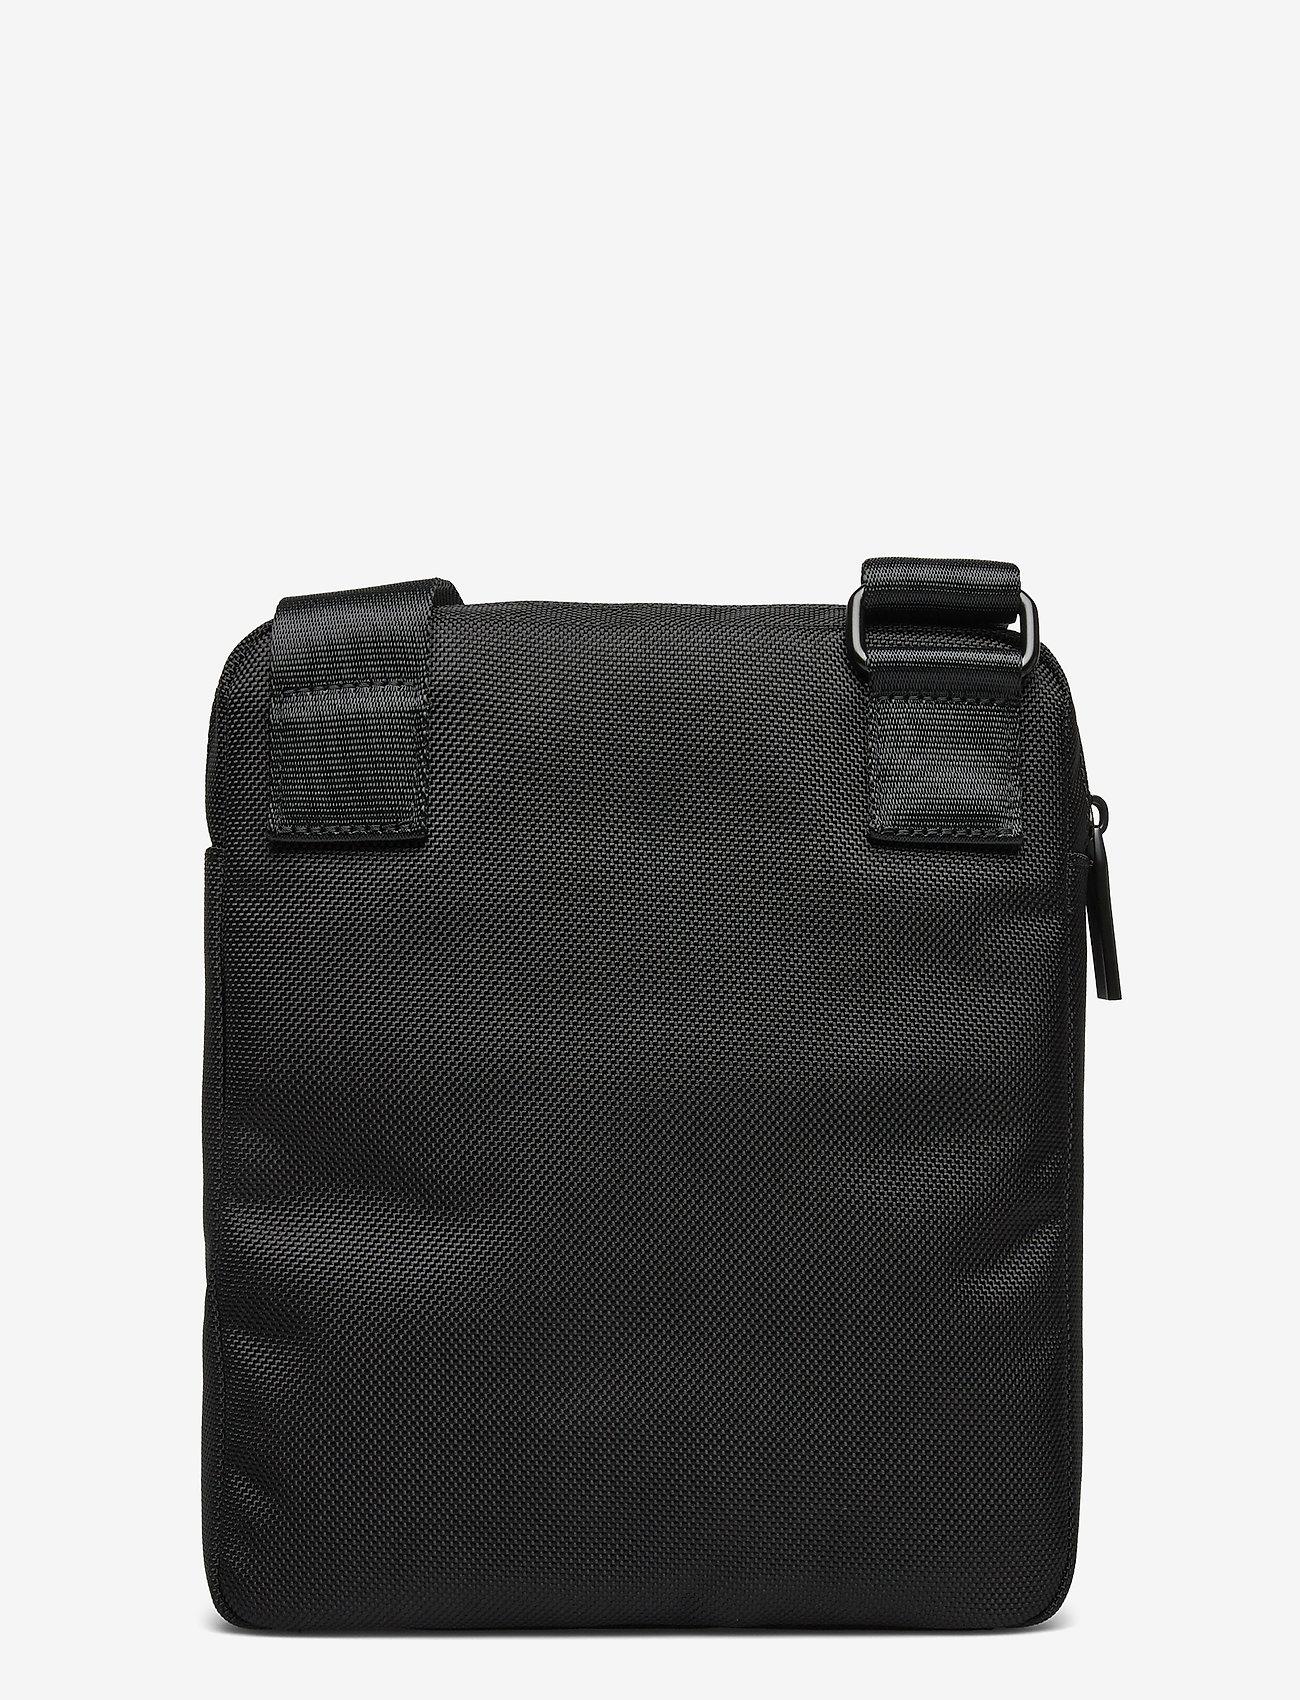 Calvin Klein - ULTIMATE NYLON FLAT - sacs à bandoulière - black - 1